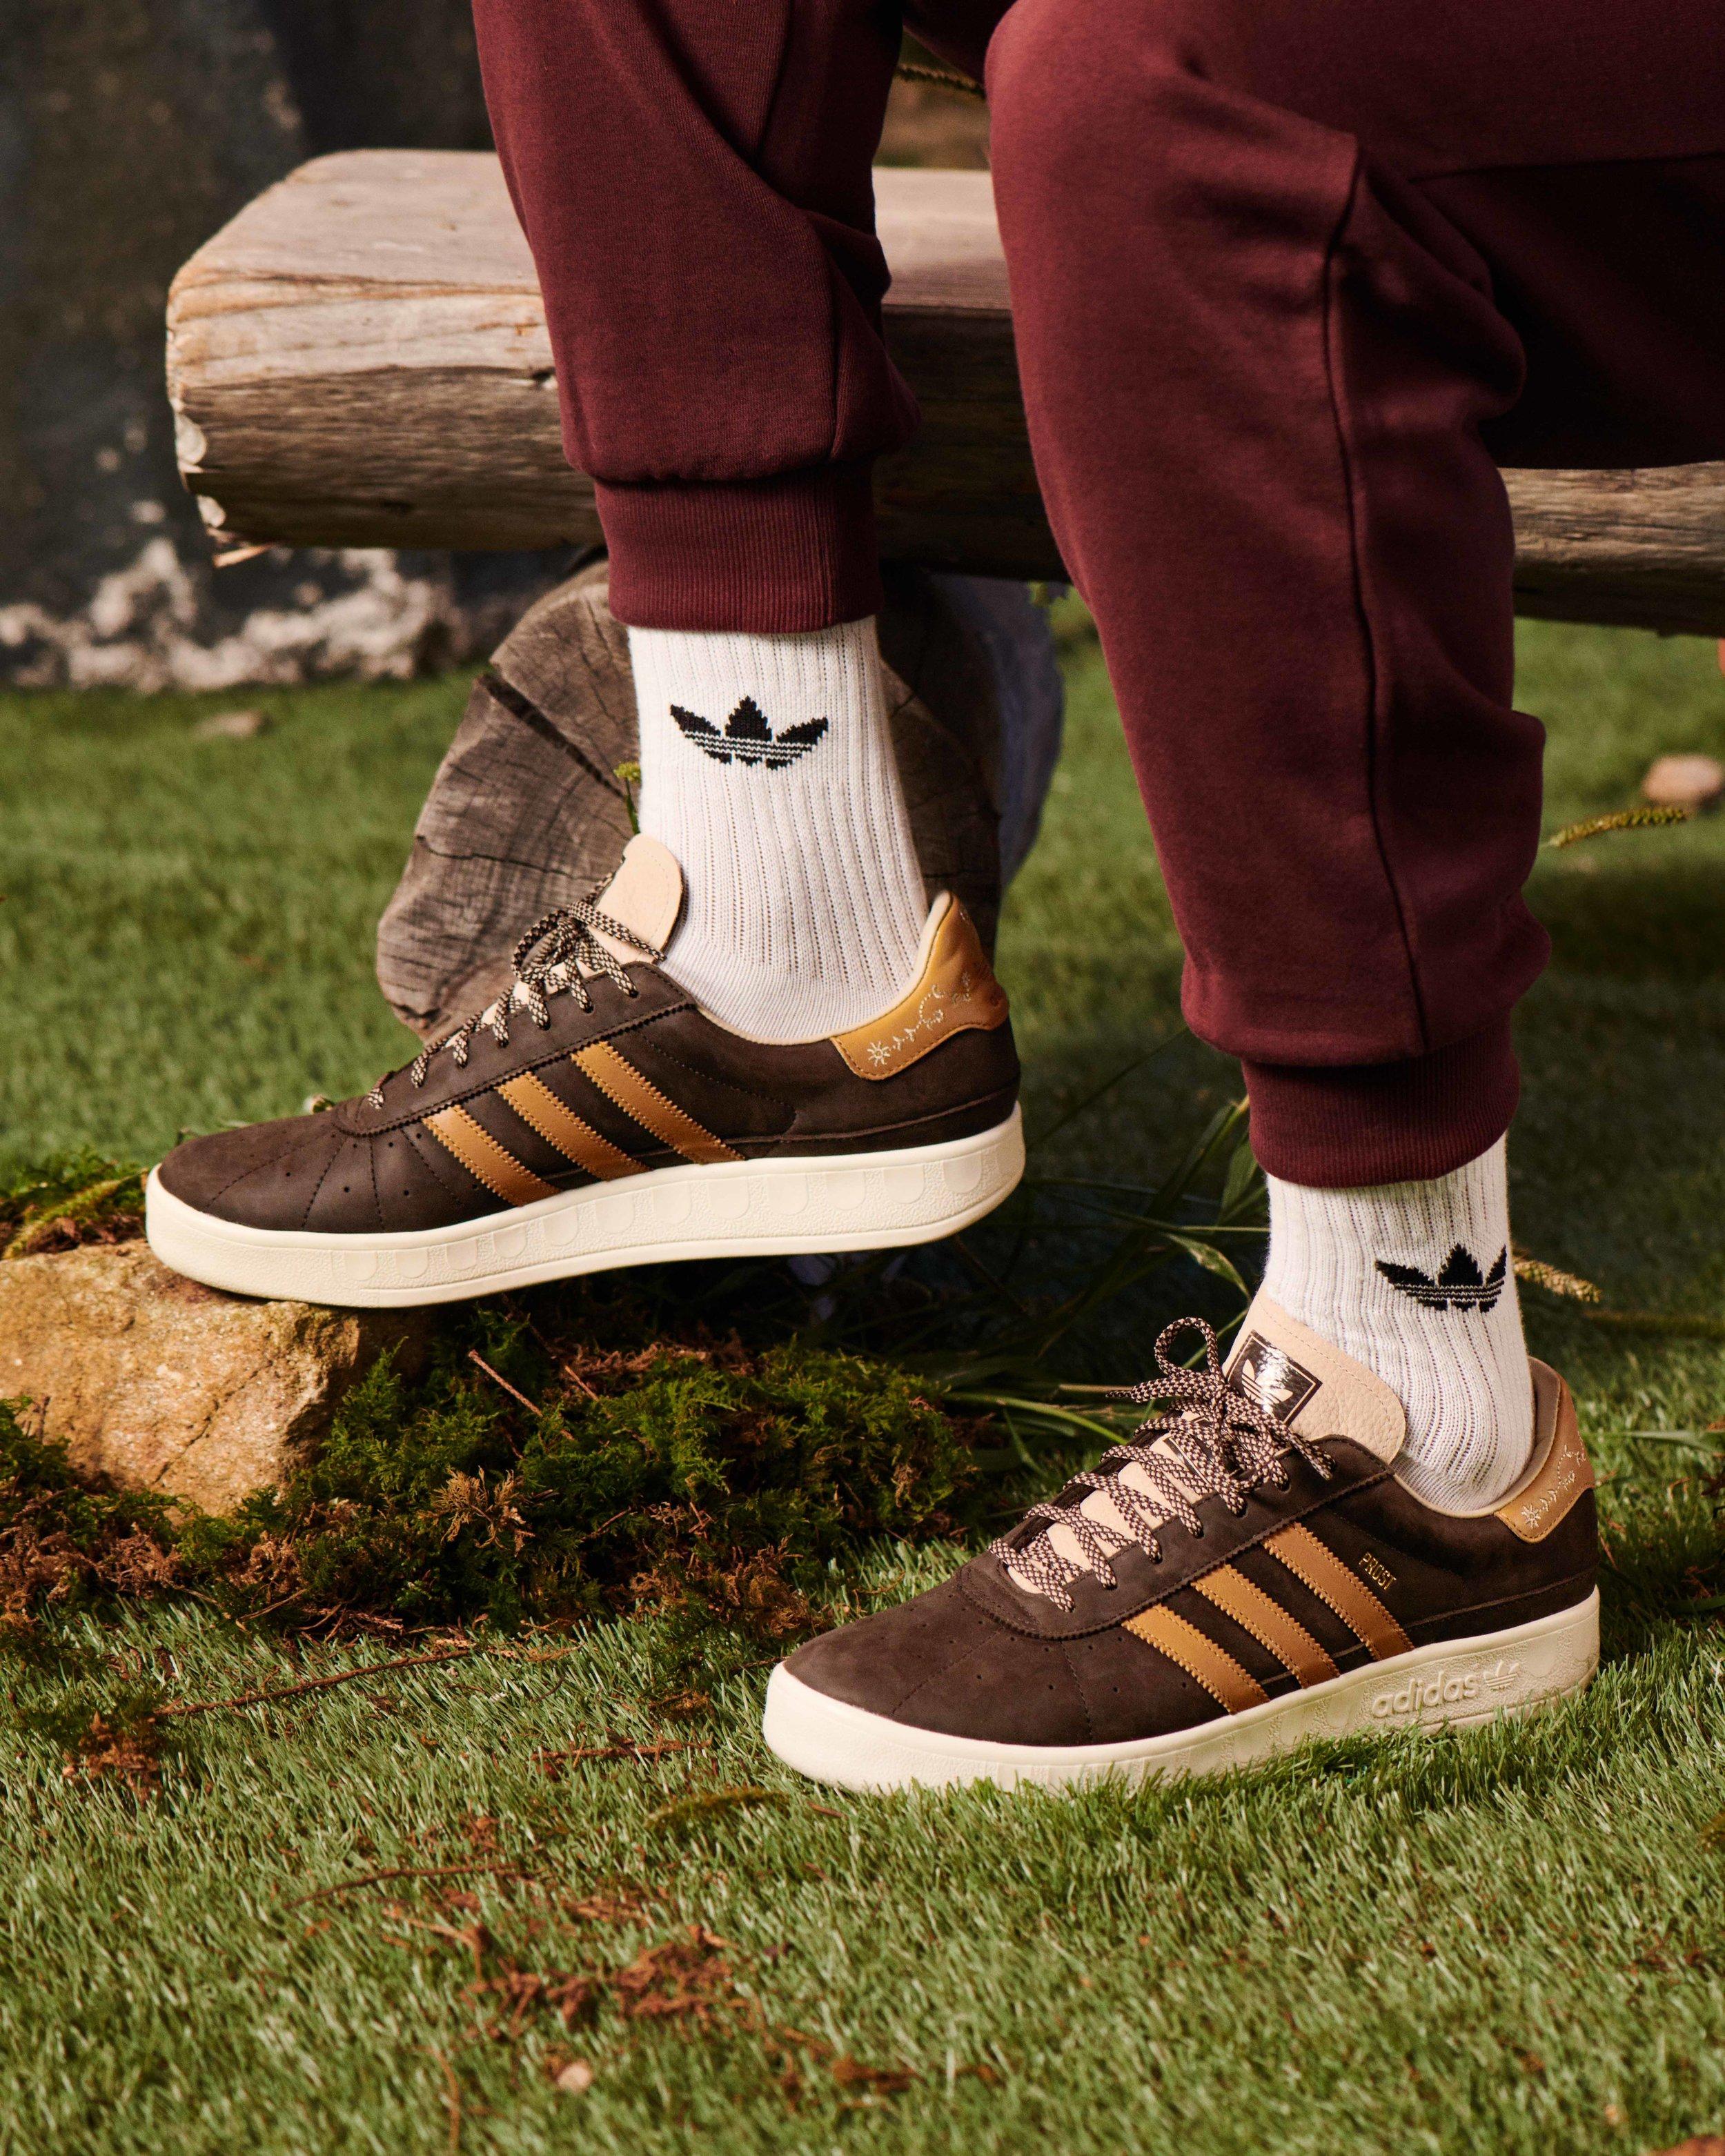 Adidas_MIG_Dark-Brown-3.jpg